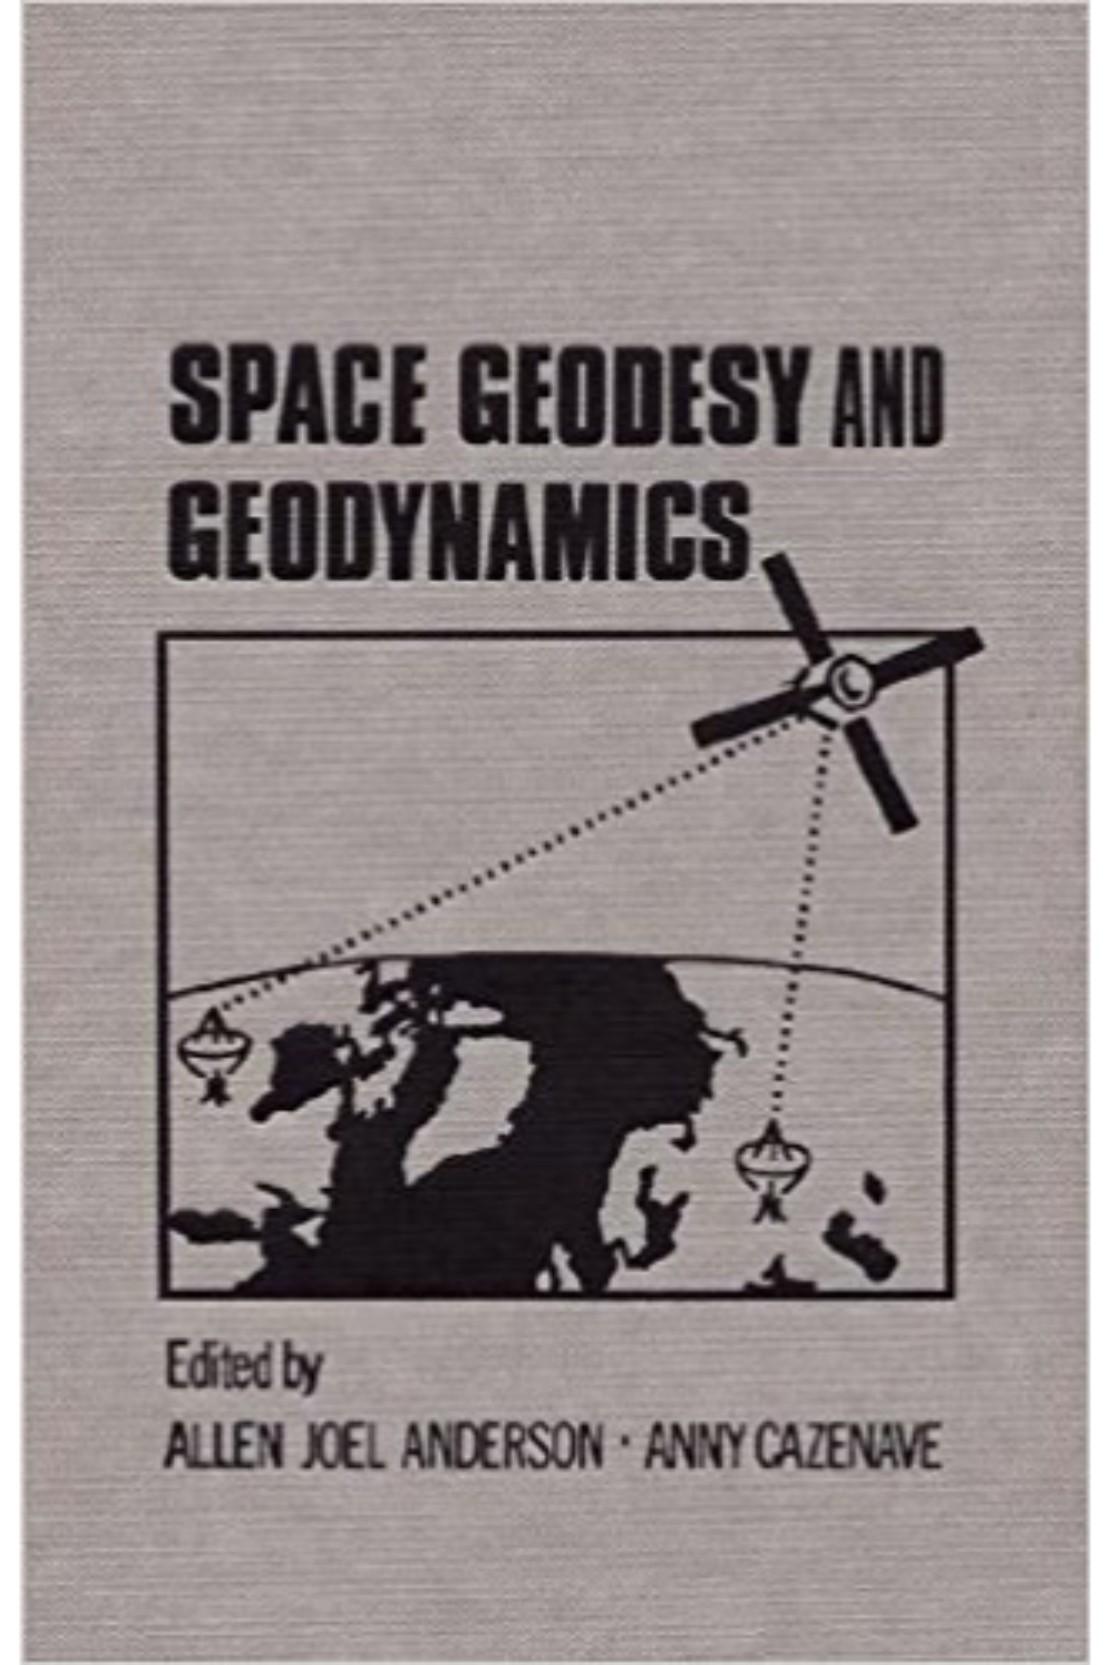 5d2292ed4dc5a Space Geodesy And Geodynamics (HB) BooksInn Shop Pakistan